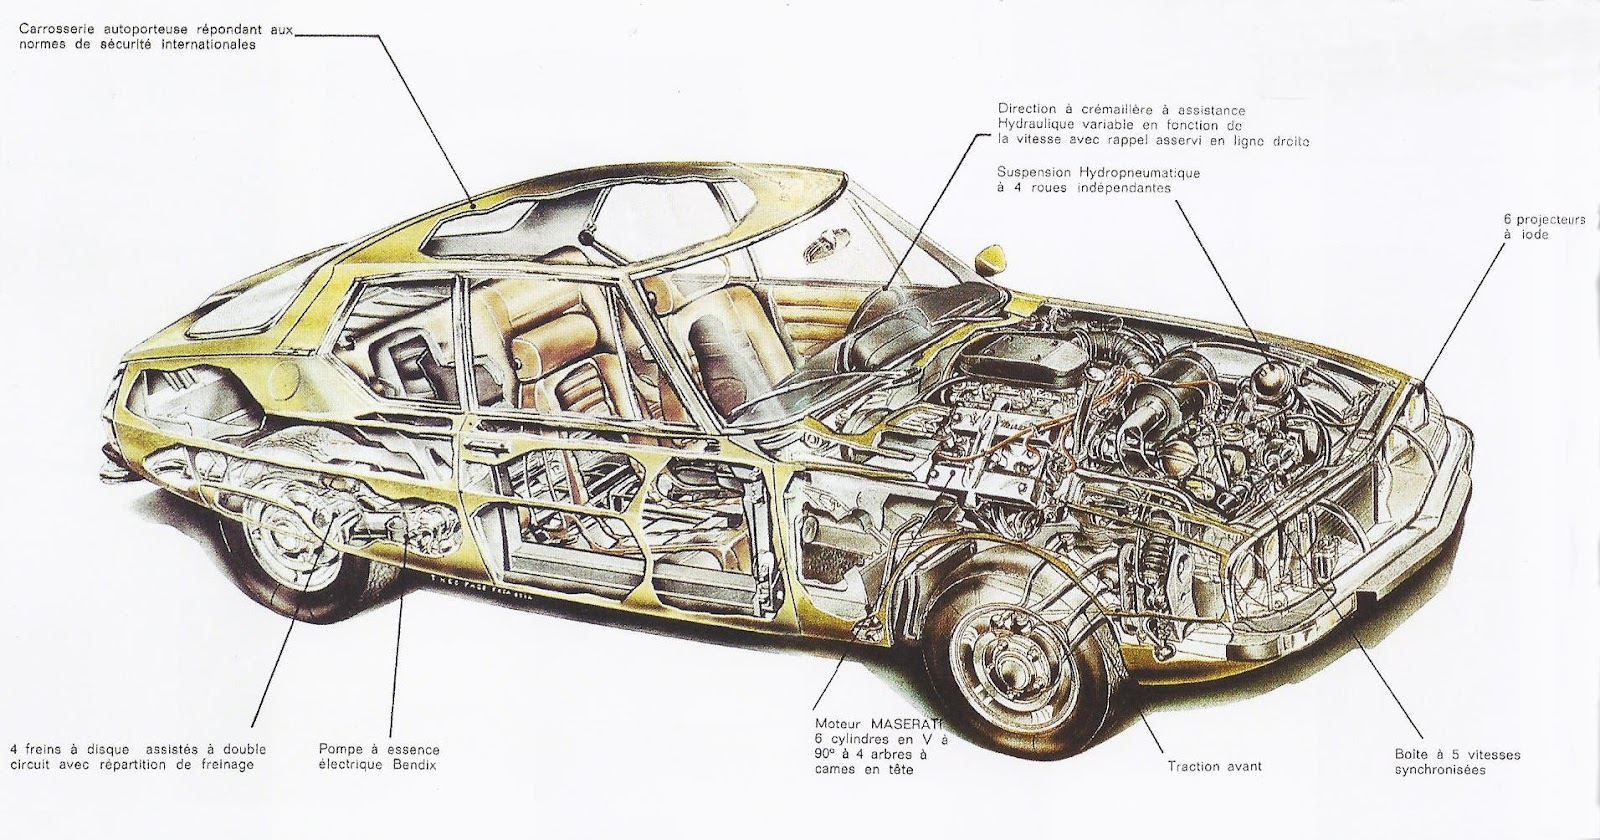 citroen sm cutaway diagrams the car hobby volkswagen w8 engine diagram [ 1600 x 840 Pixel ]